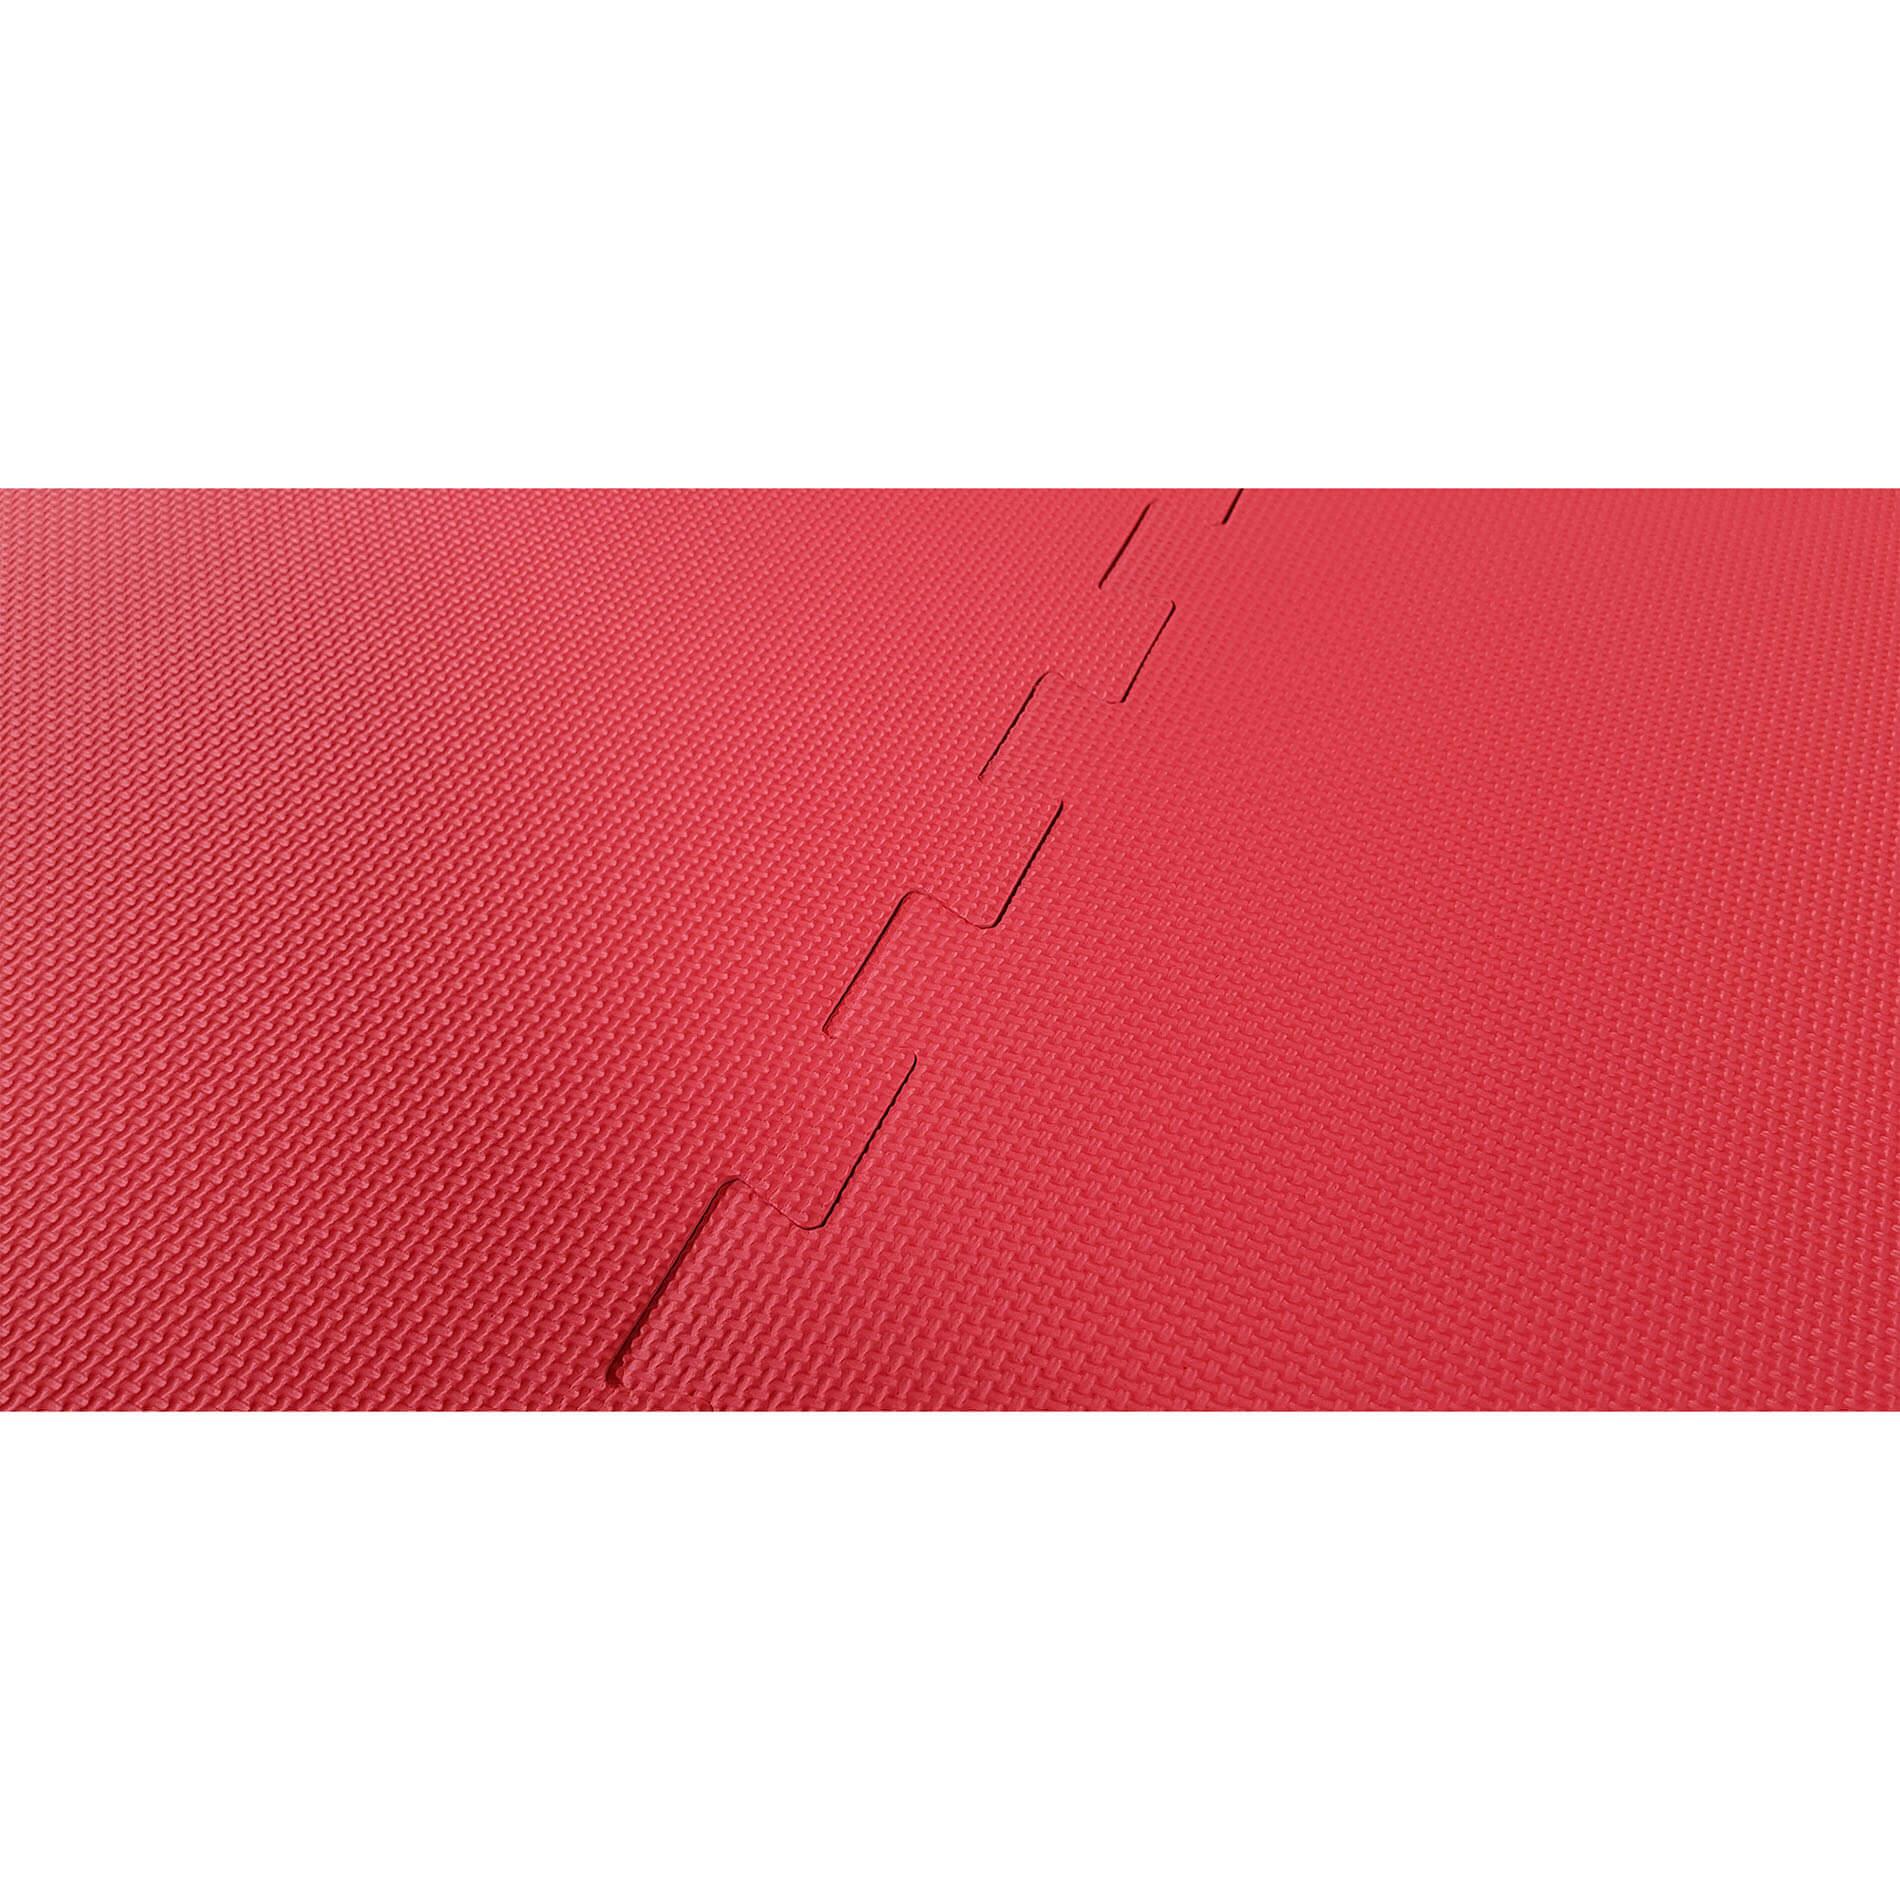 Puzzelmat - Sportvloer - Rood/Zwart